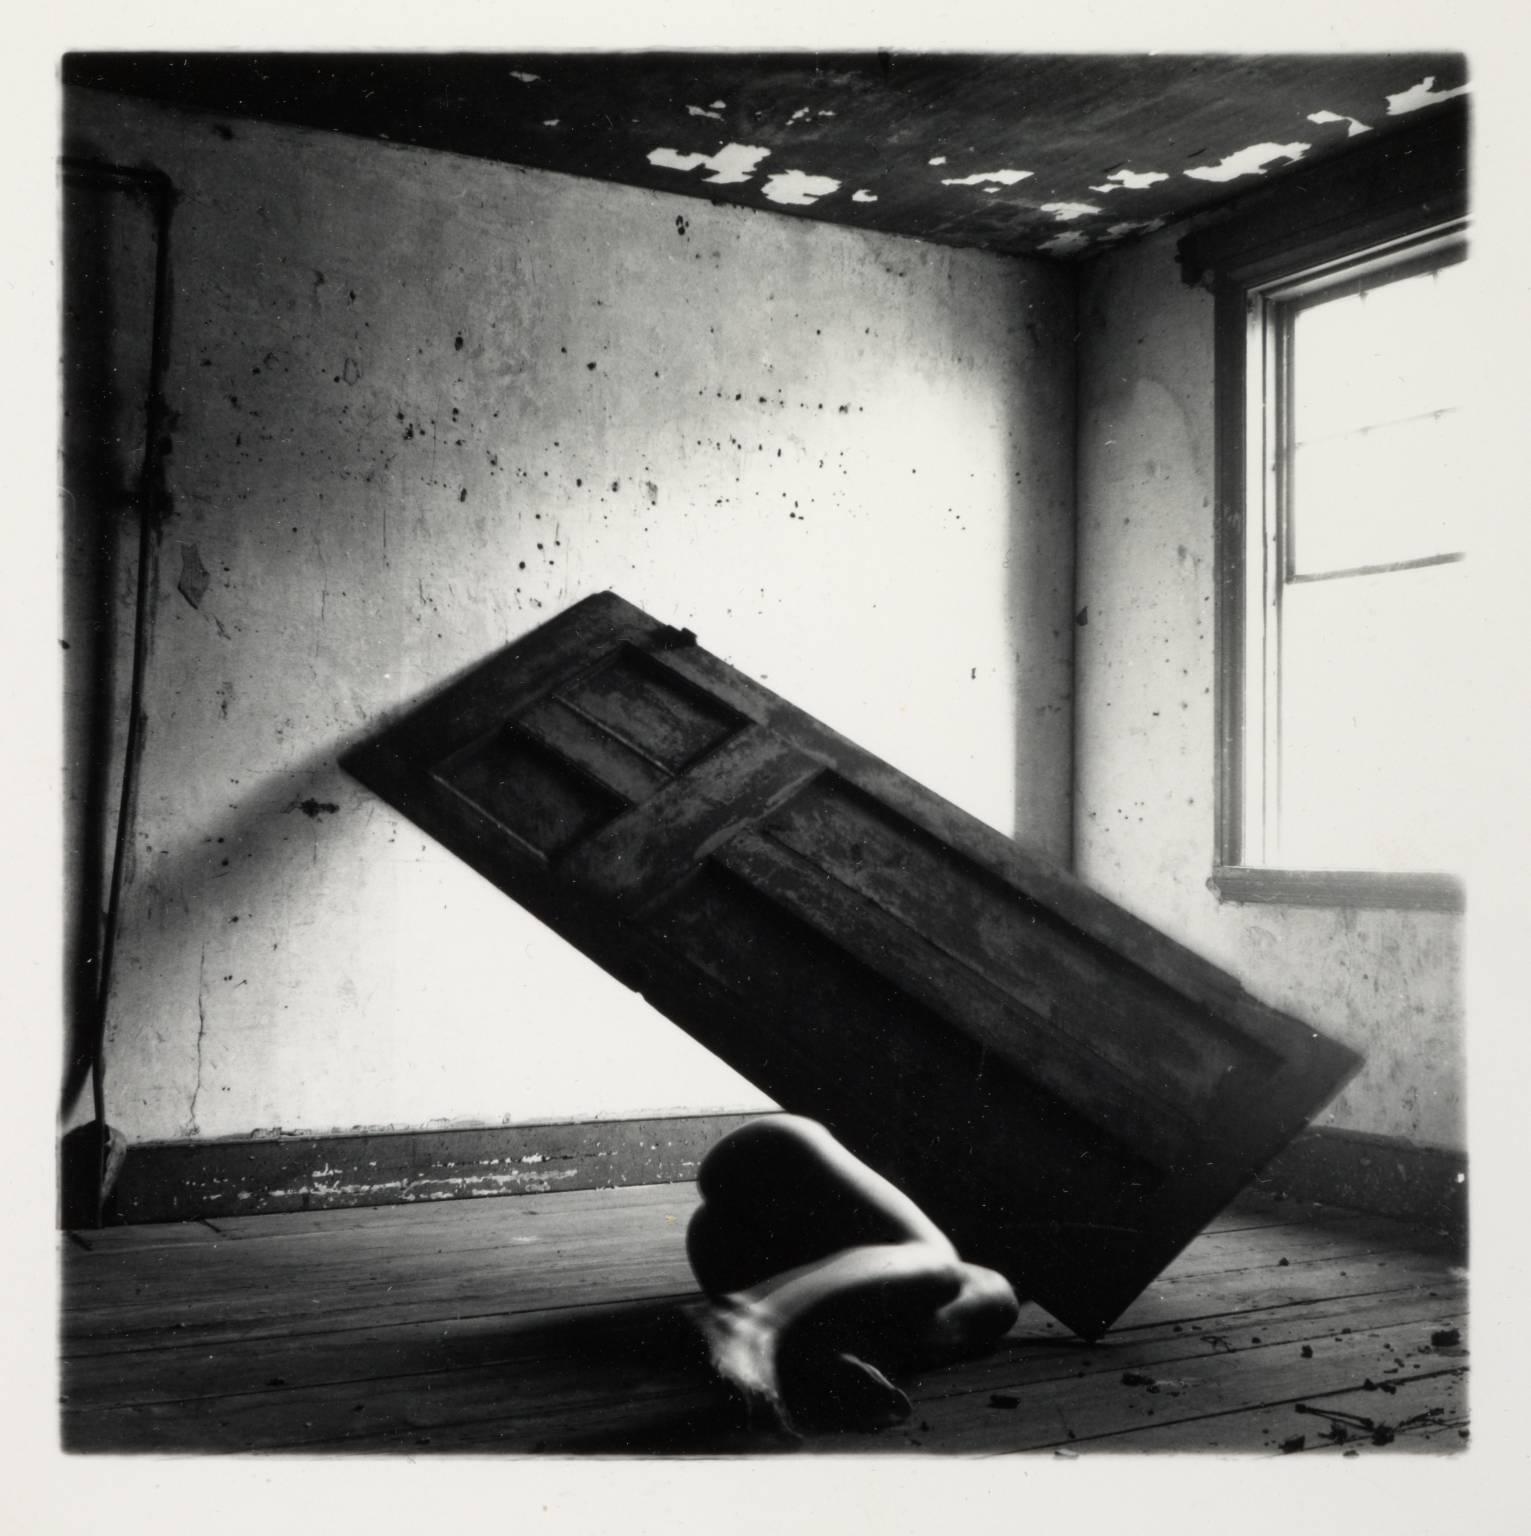 Untitled 1975-80 by Francesca Woodman 1958-1981